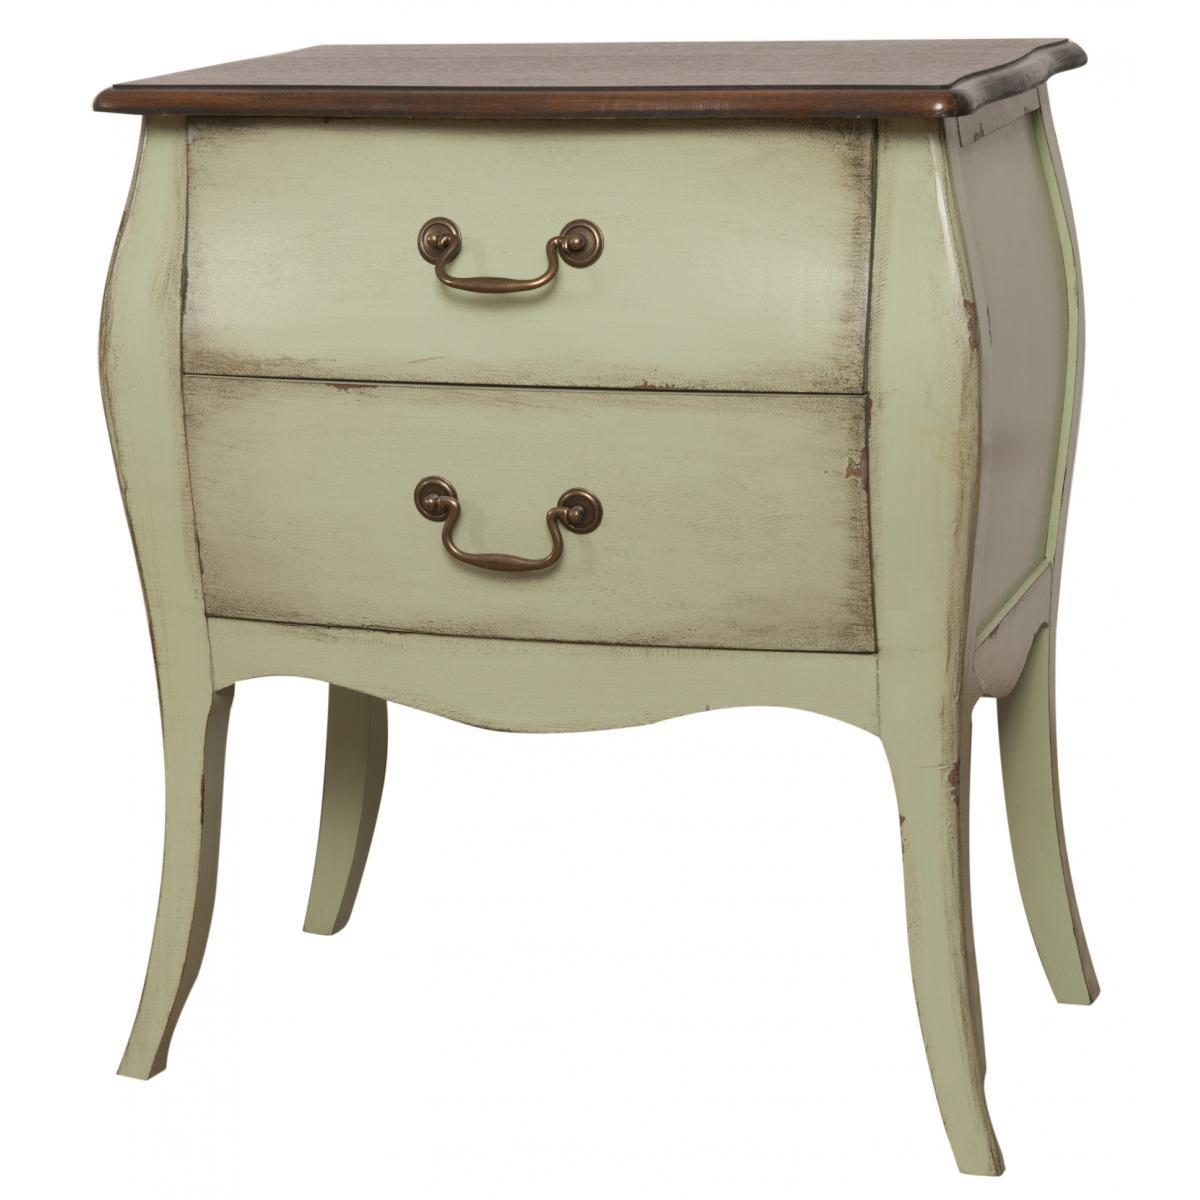 Cabinet din lemn de plop, furnir si MDF, cu 2 sertare Mellow Low Olive / Brown, l62xA38xH72 cm imagine